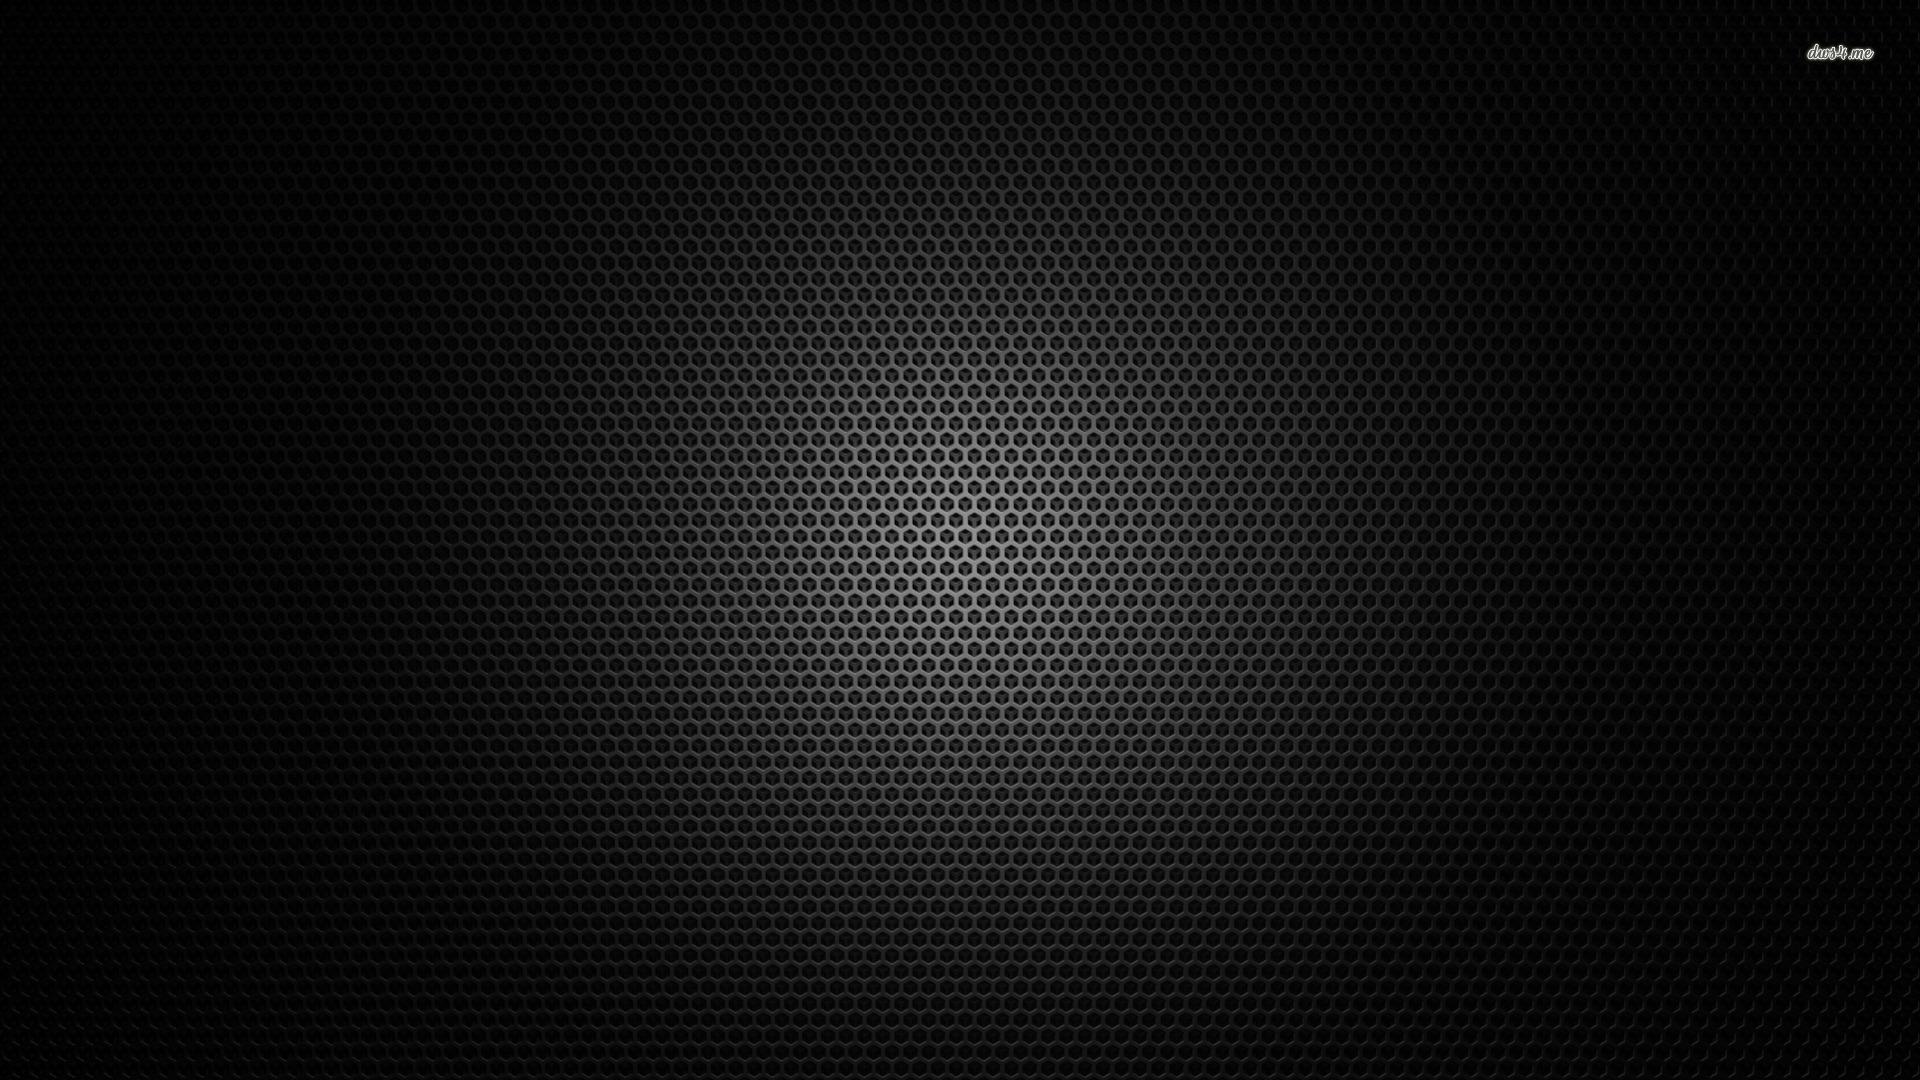 Carbon fiber wallpaper   Abstract wallpapers   8893 1920x1080